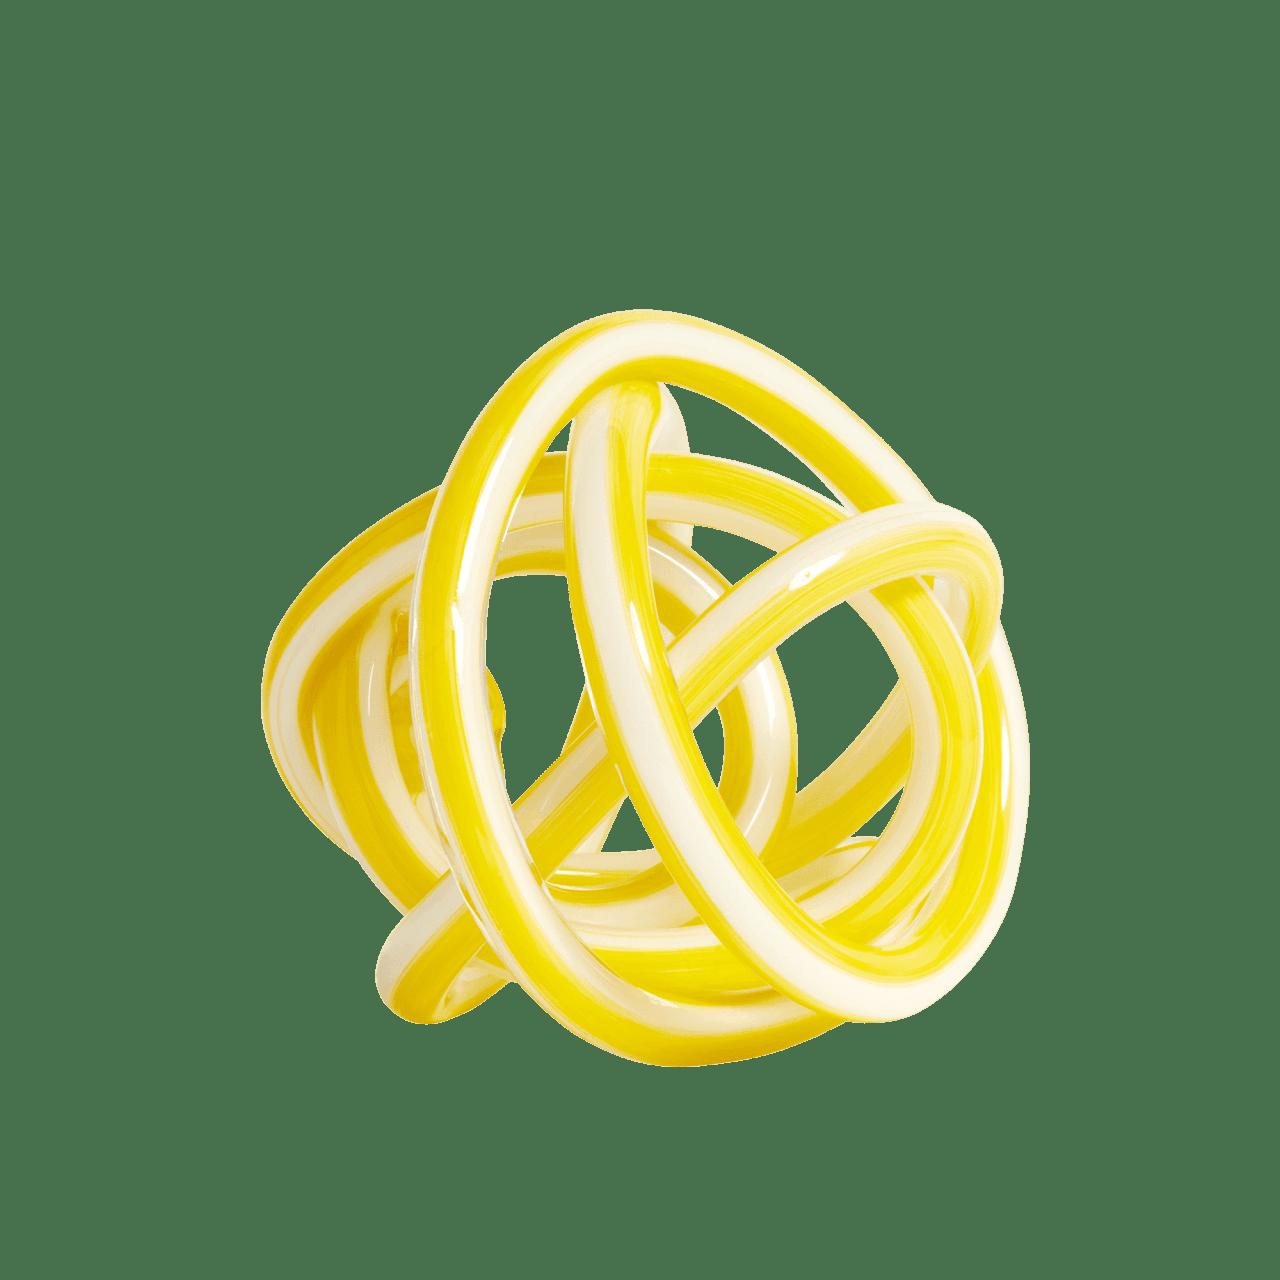 Knot Glasobjekt